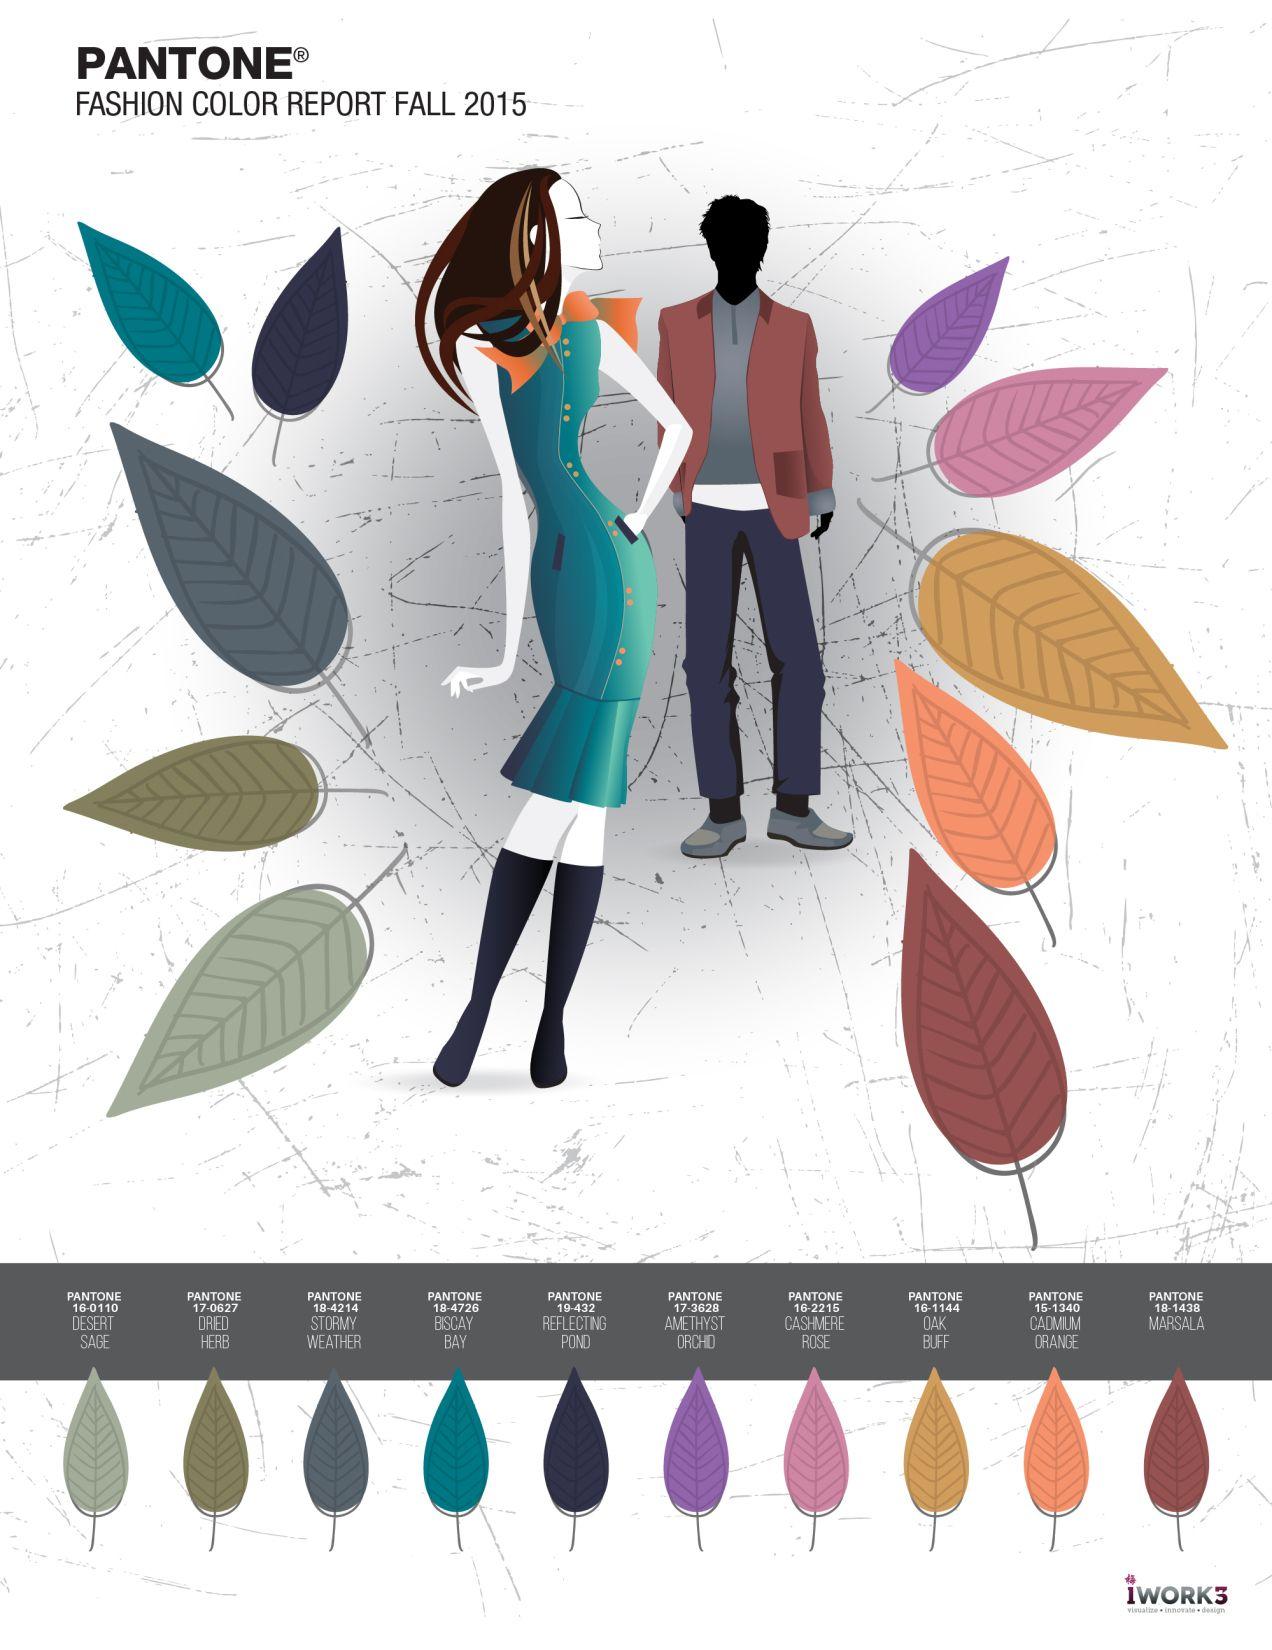 pantone fall winter 2015 2016 colors hex colors pinterest pantone pantone 2015 and fall. Black Bedroom Furniture Sets. Home Design Ideas